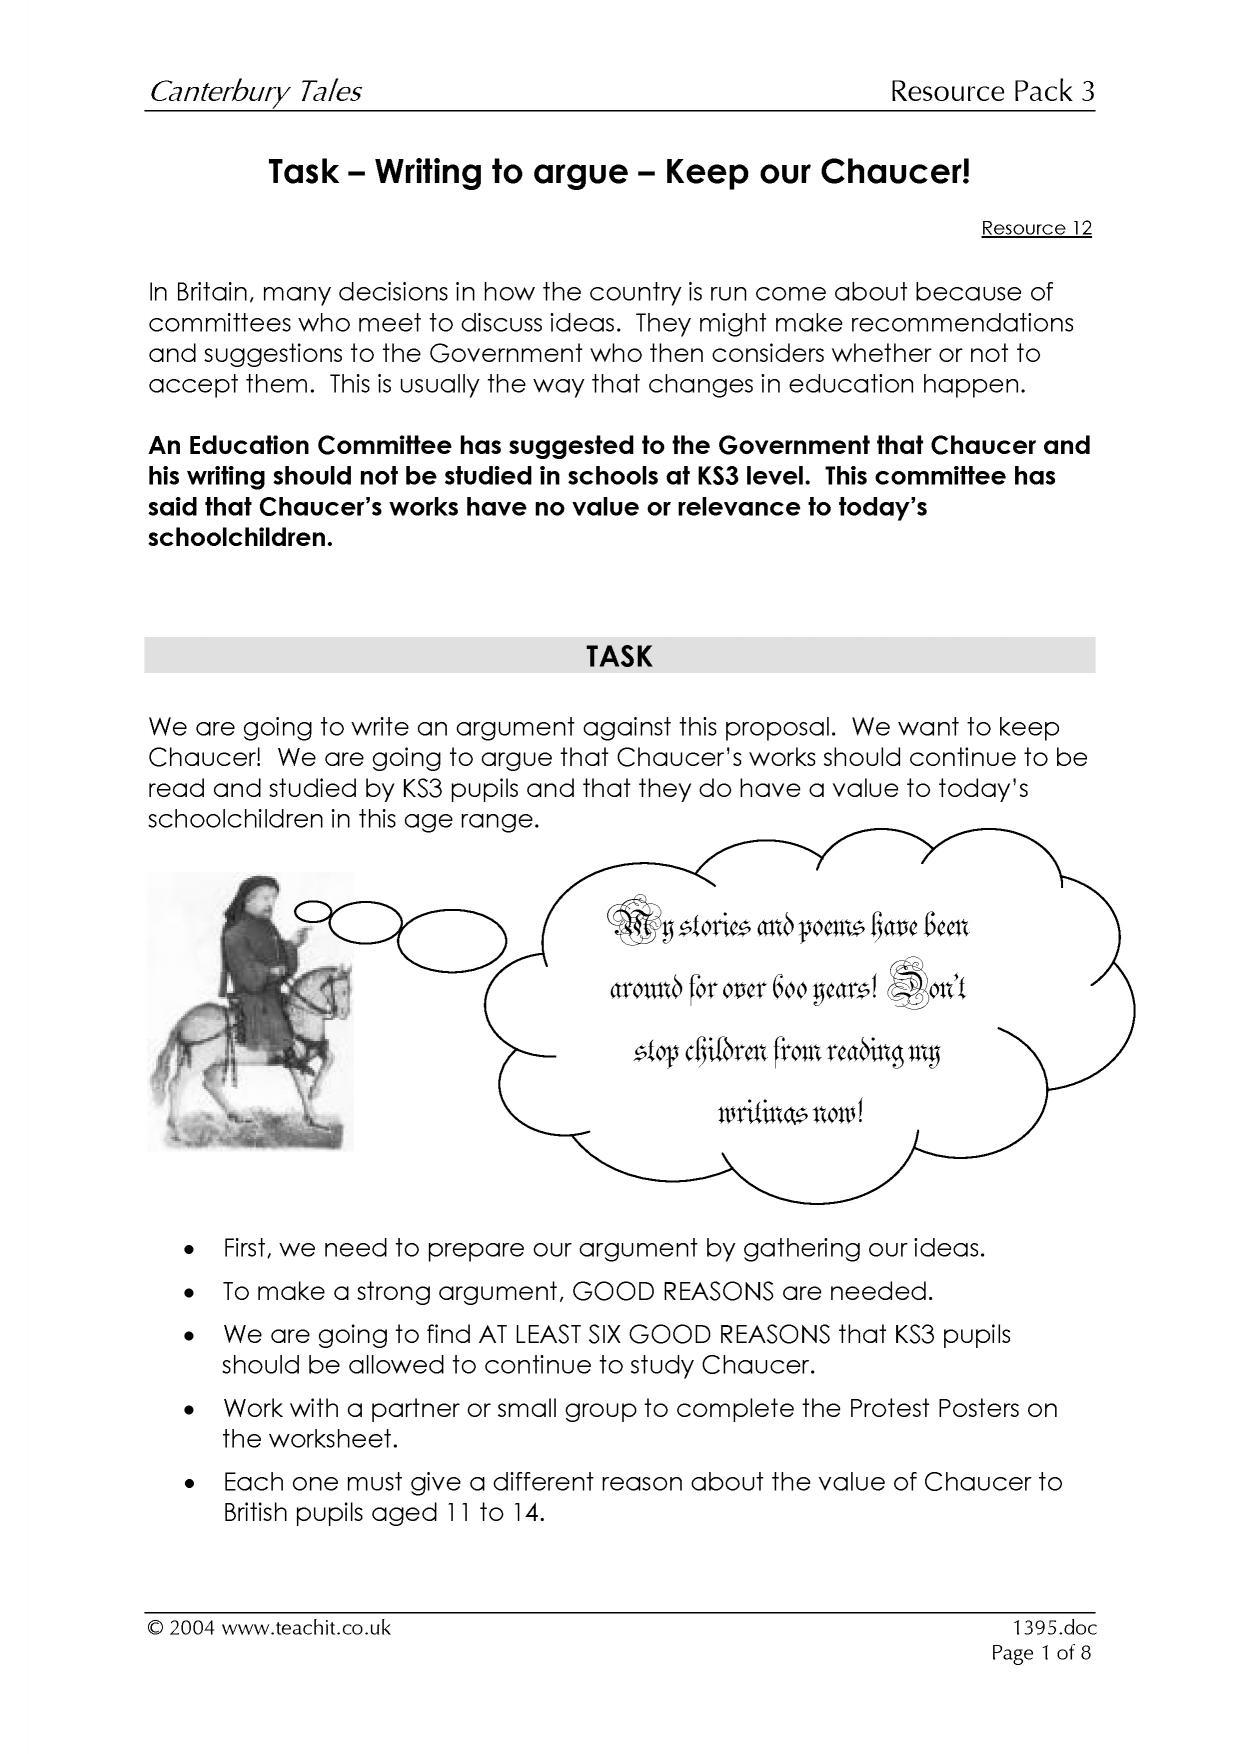 Causal chain essay